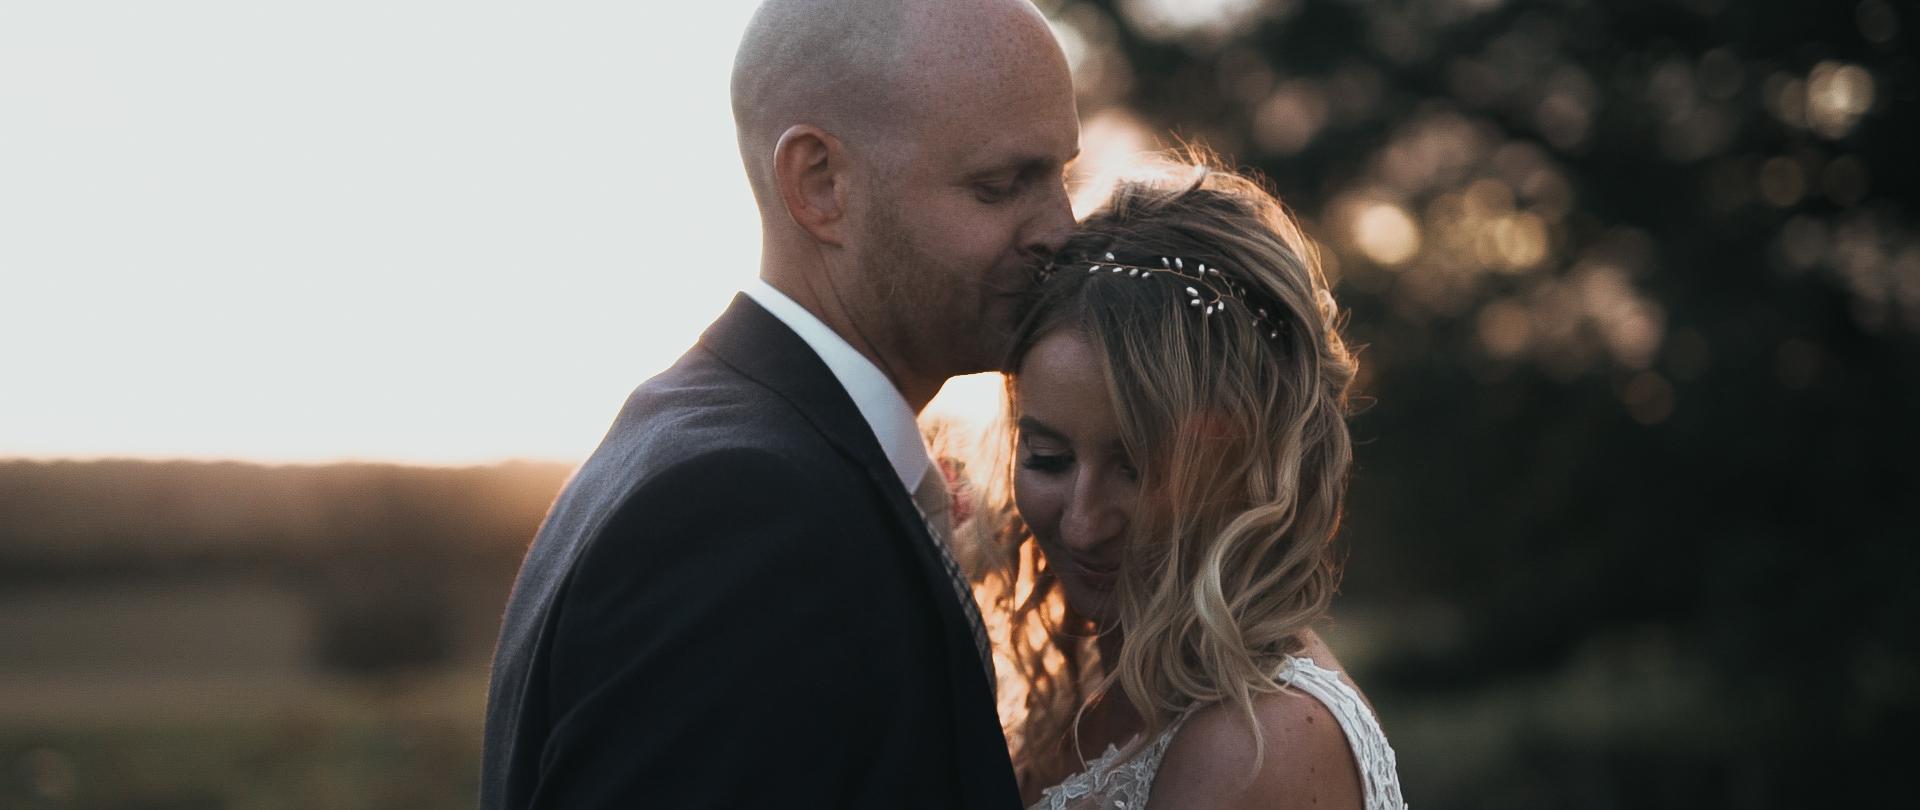 Gaynes Park Wedding Video - Philip Smith Visuals